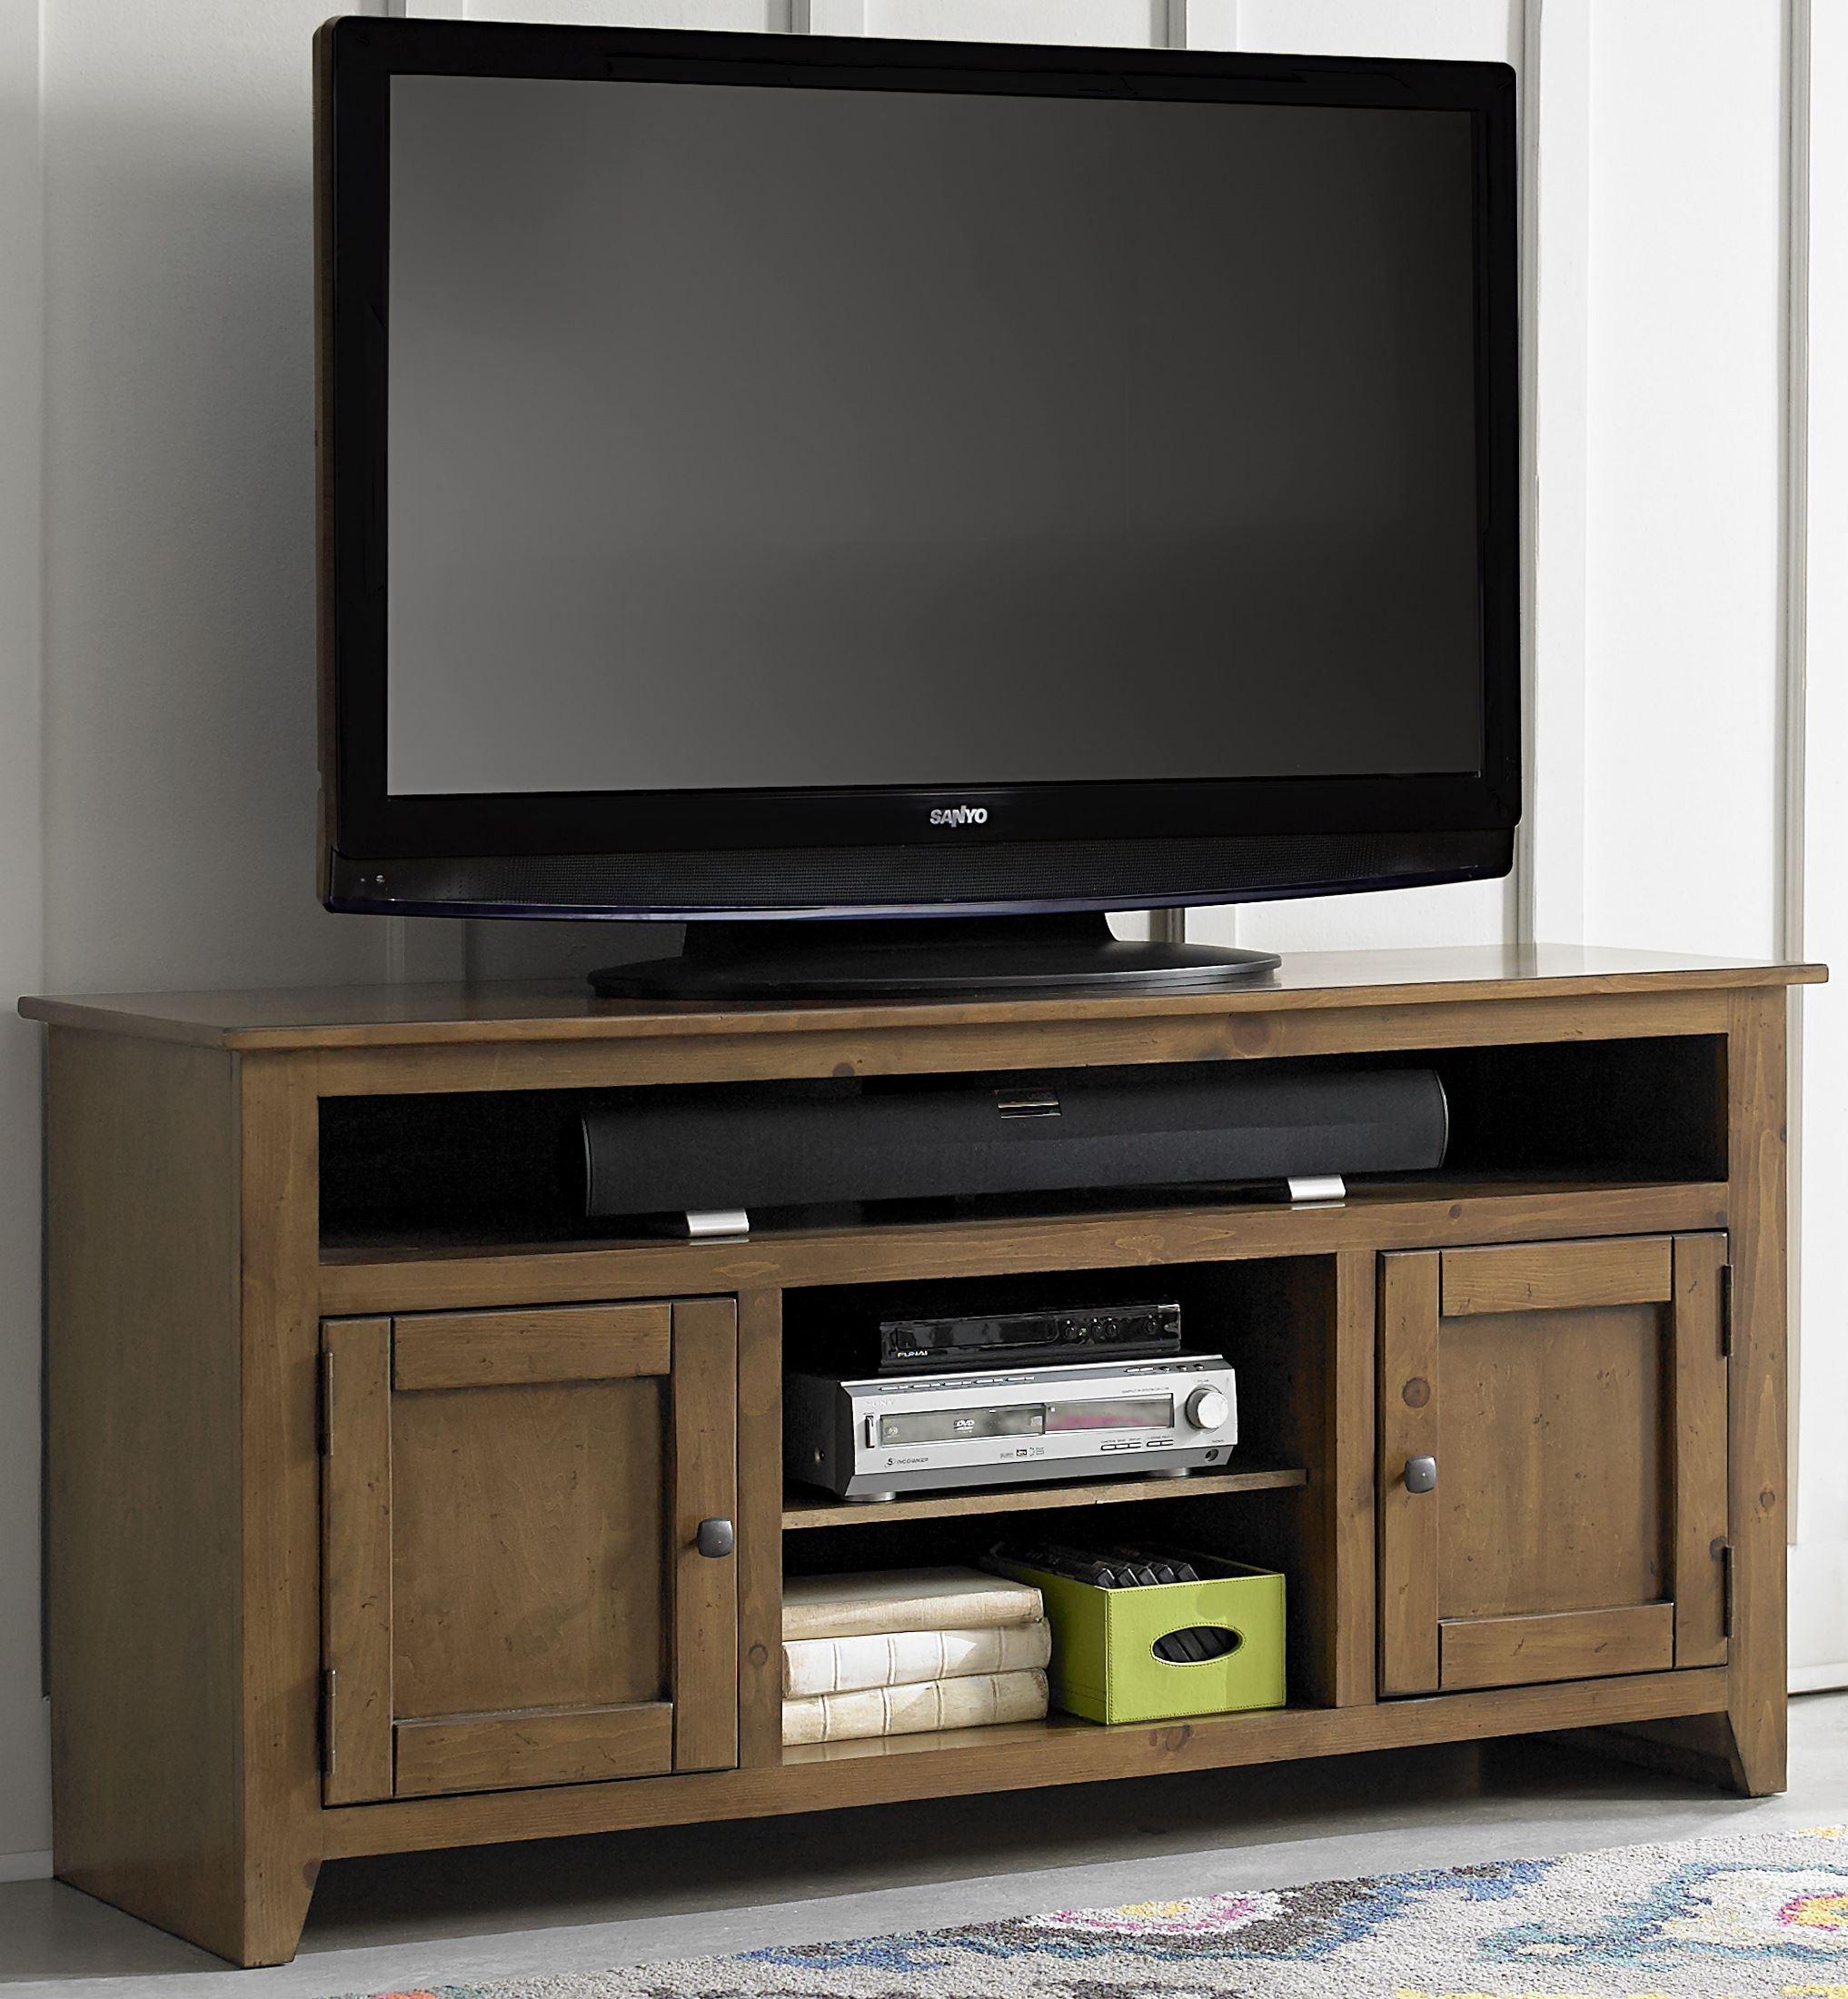 Rio Bravo 58 Medium Pine Entertainment Console From Progressive Furniture Coleman Furniture